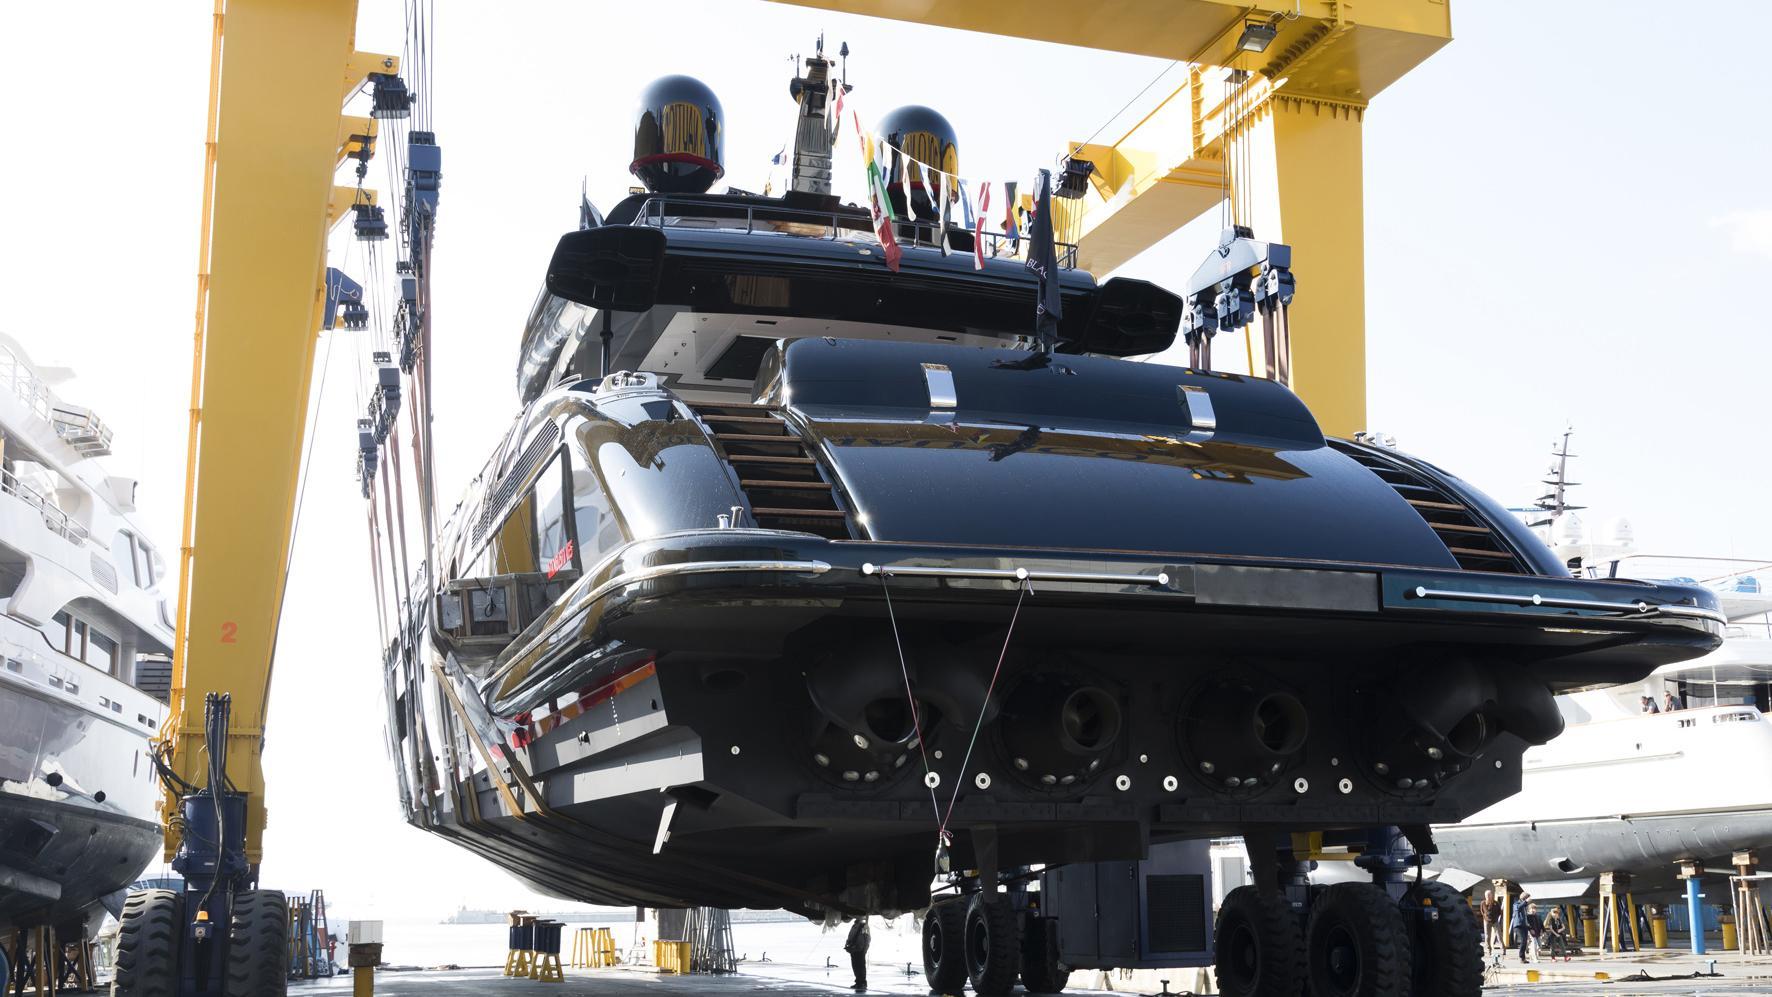 mangusta 165 hull 12 motoryacht overmarine mangusta 165 50m 2017 launch half stern